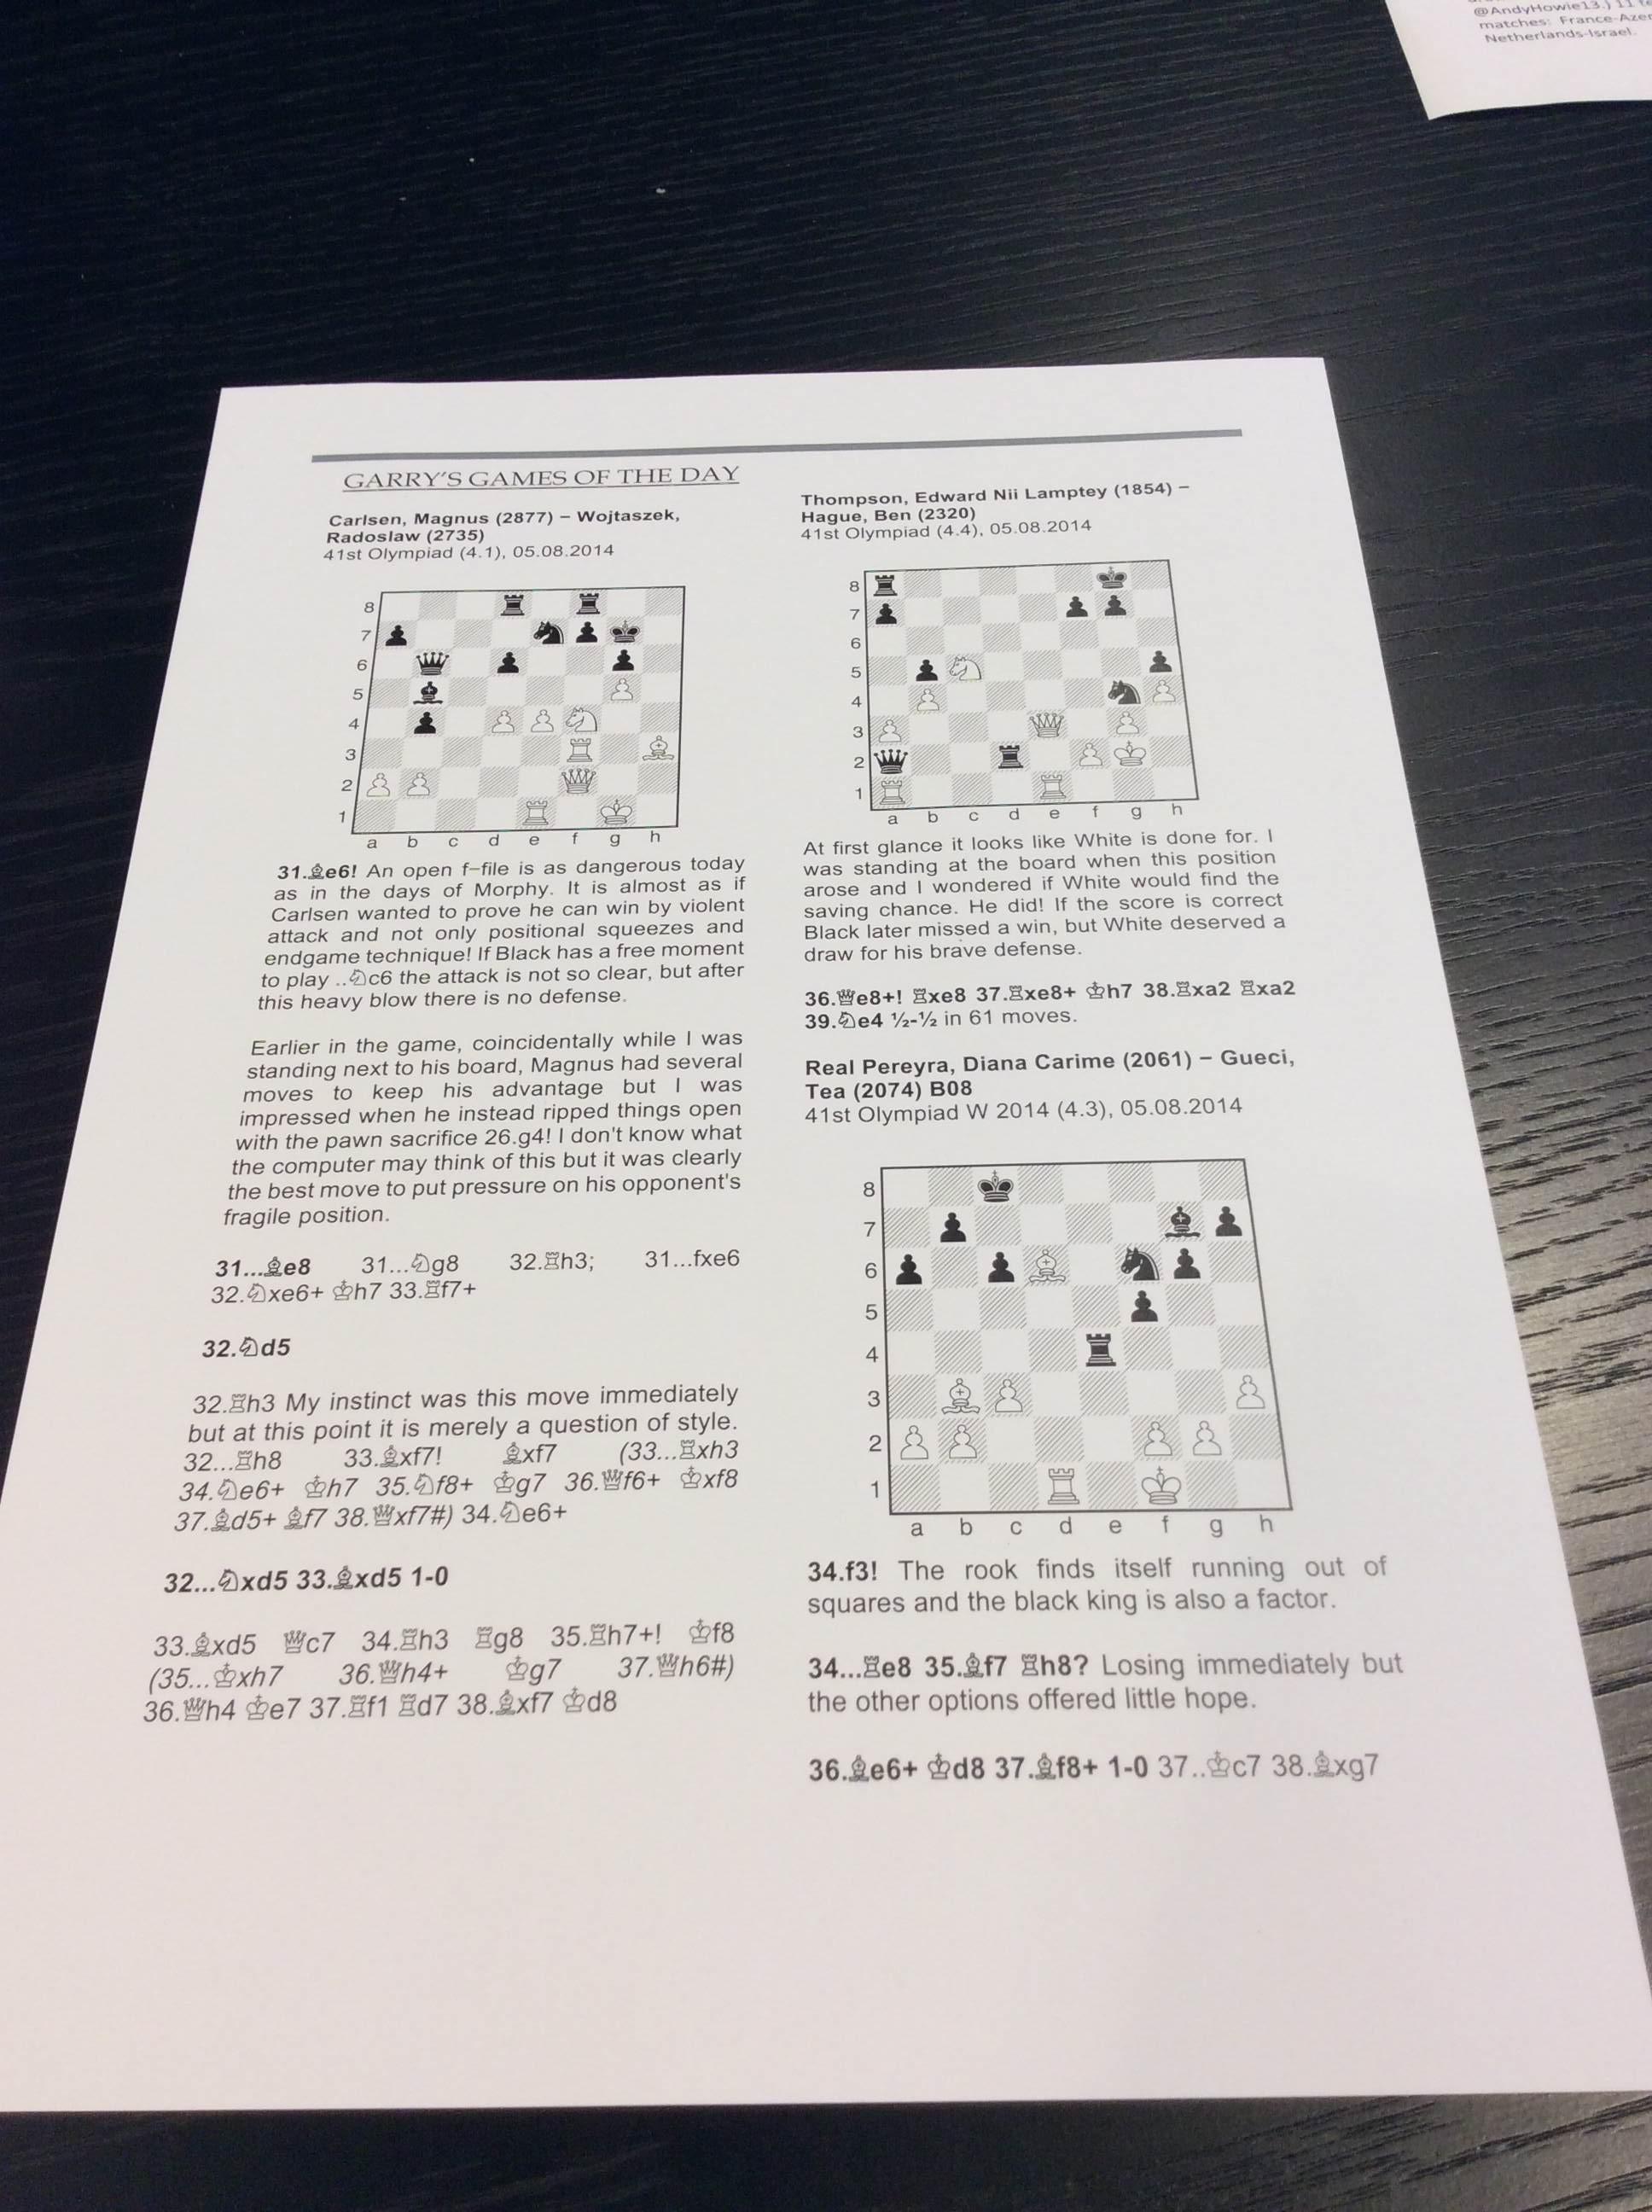 Garry's Game of the Day.  Carlsen, Magnus (2877) - Wojtaszek, Radoslaw (2735) August 5th, 2014